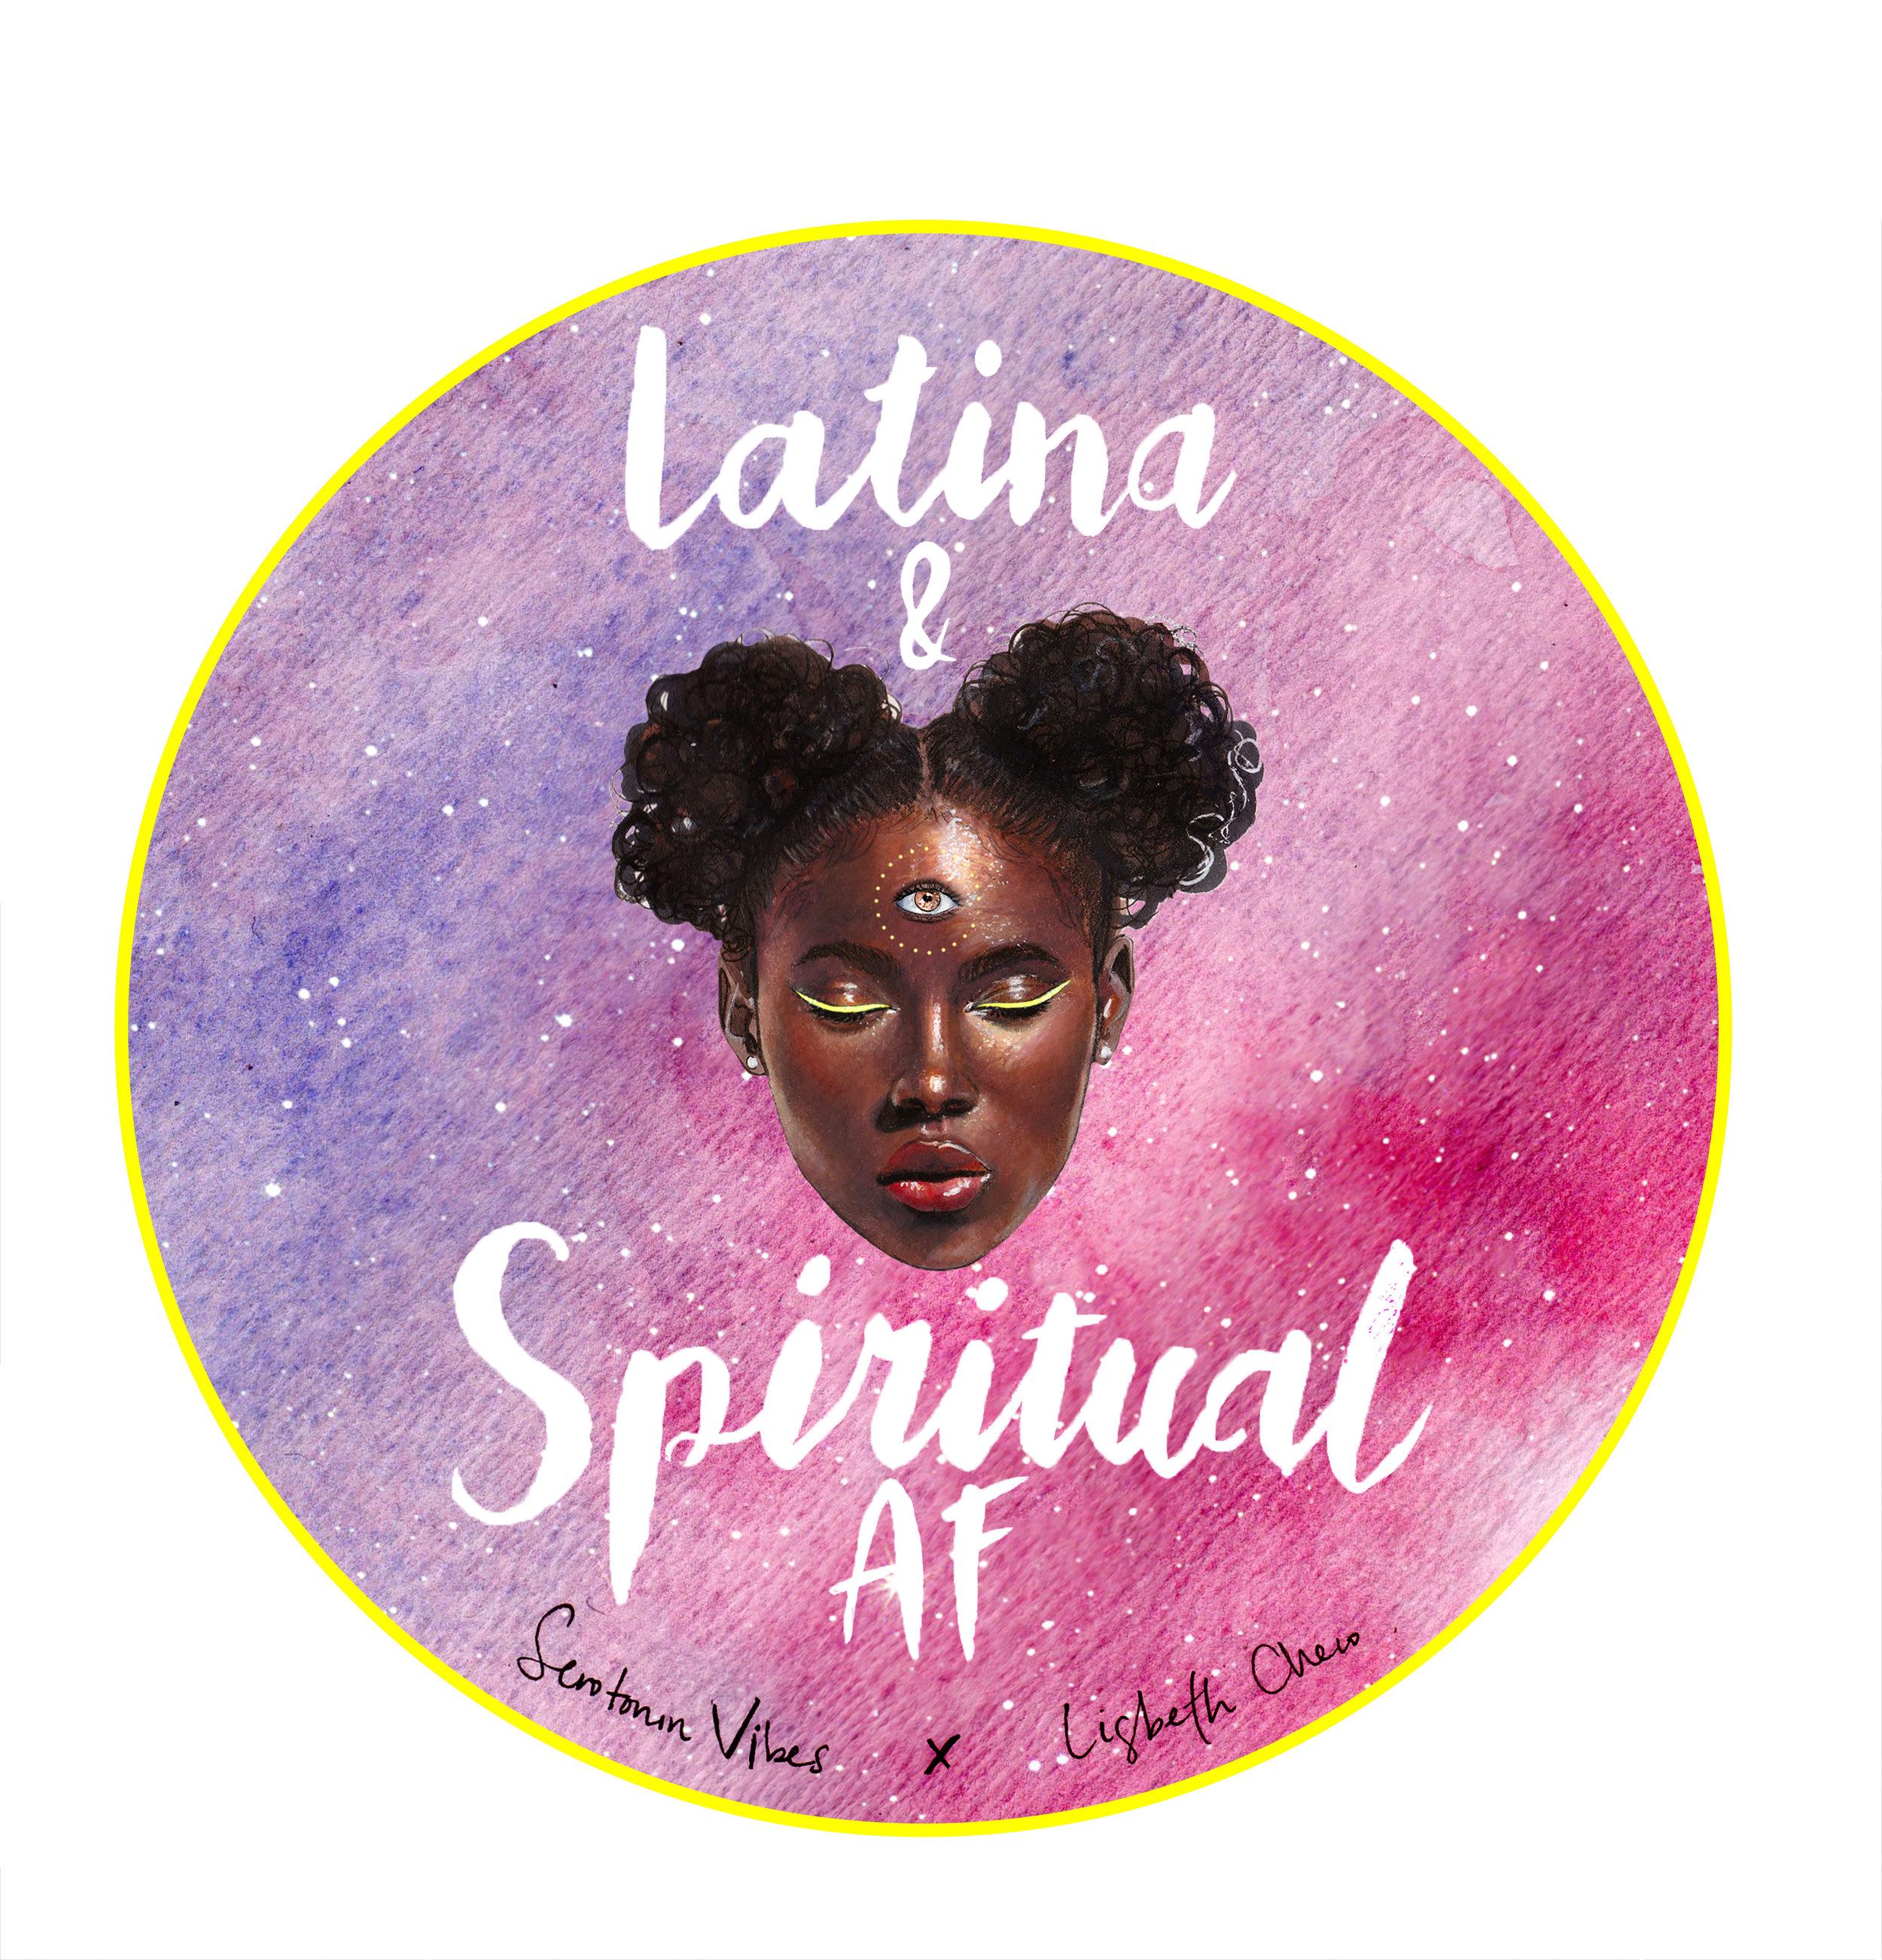 latinaandspiritual5.jpg